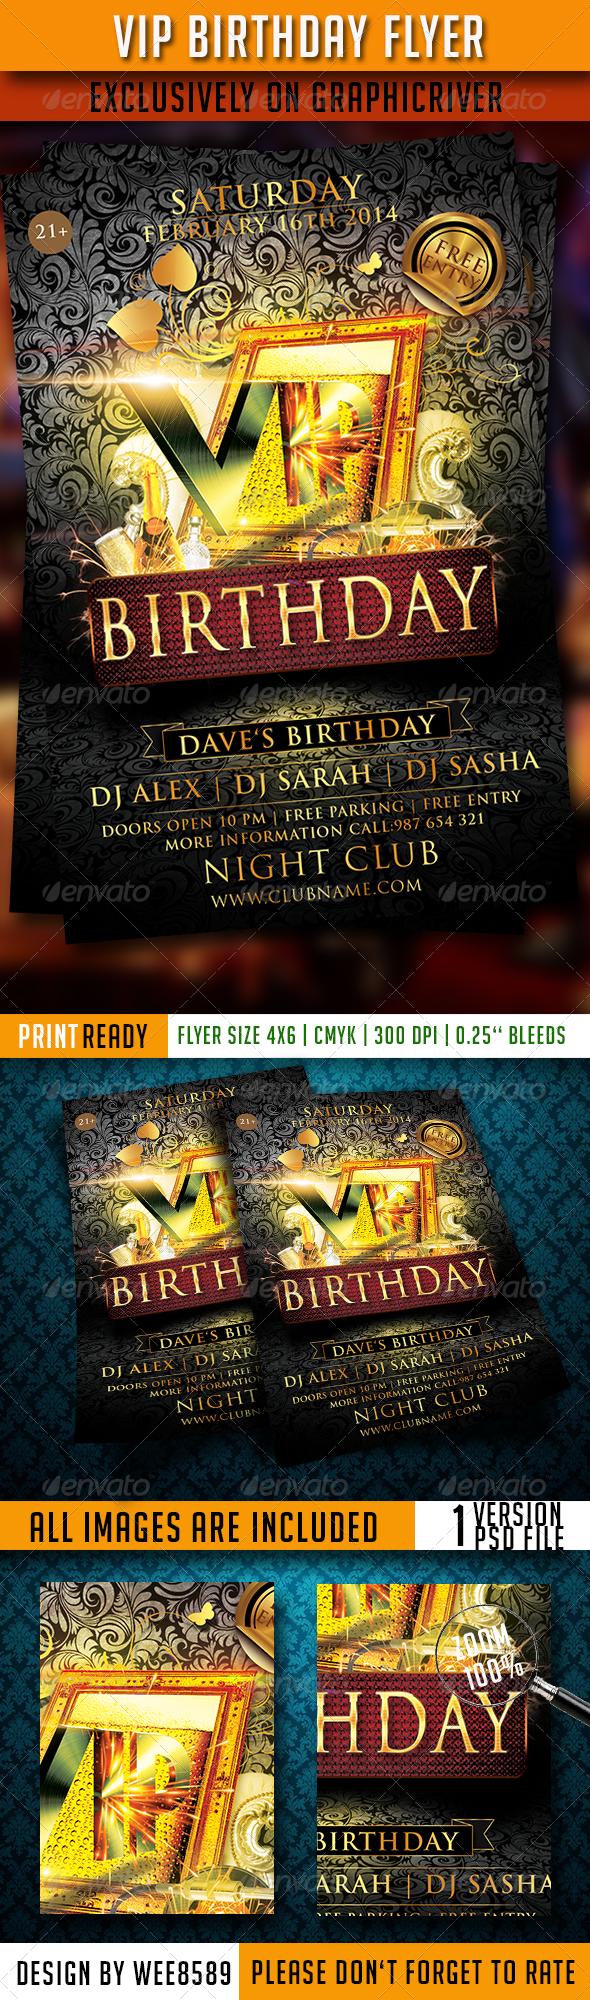 GraphicRiver VIP Birthday Flyer Template 6749055